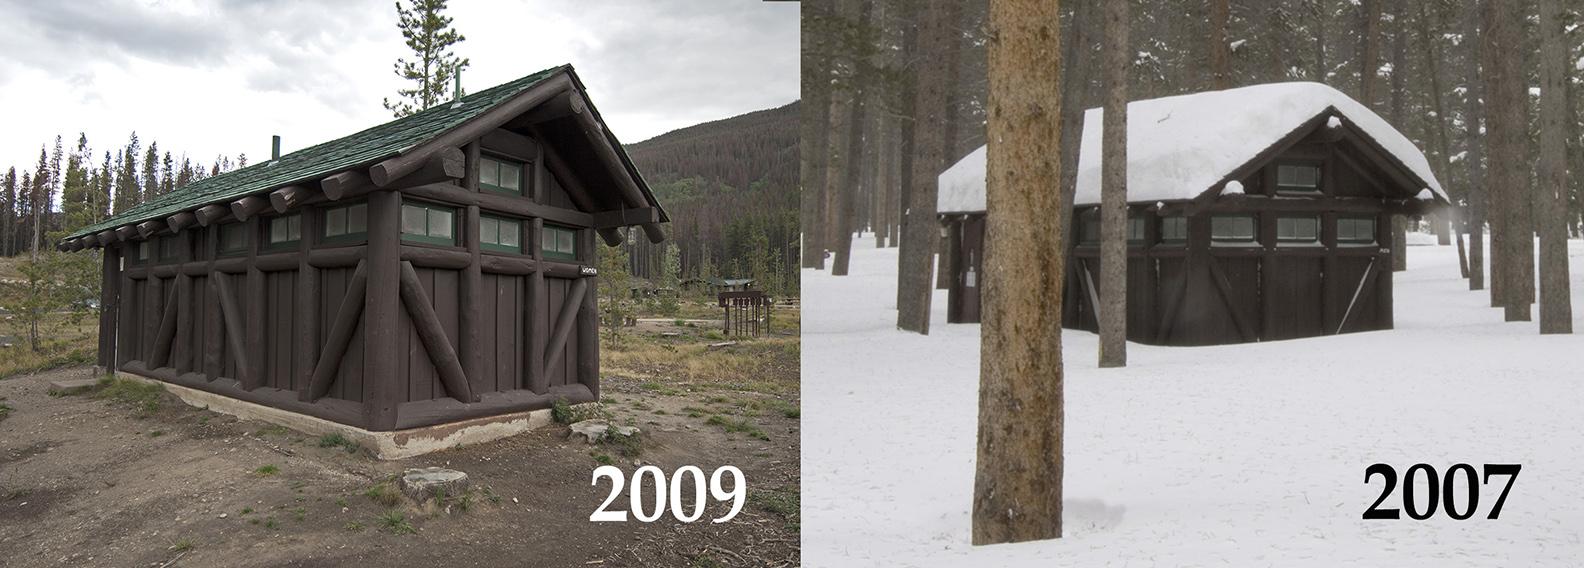 comfort-station-comparison-2007-2009-timber-creek-winter-rmnp-2